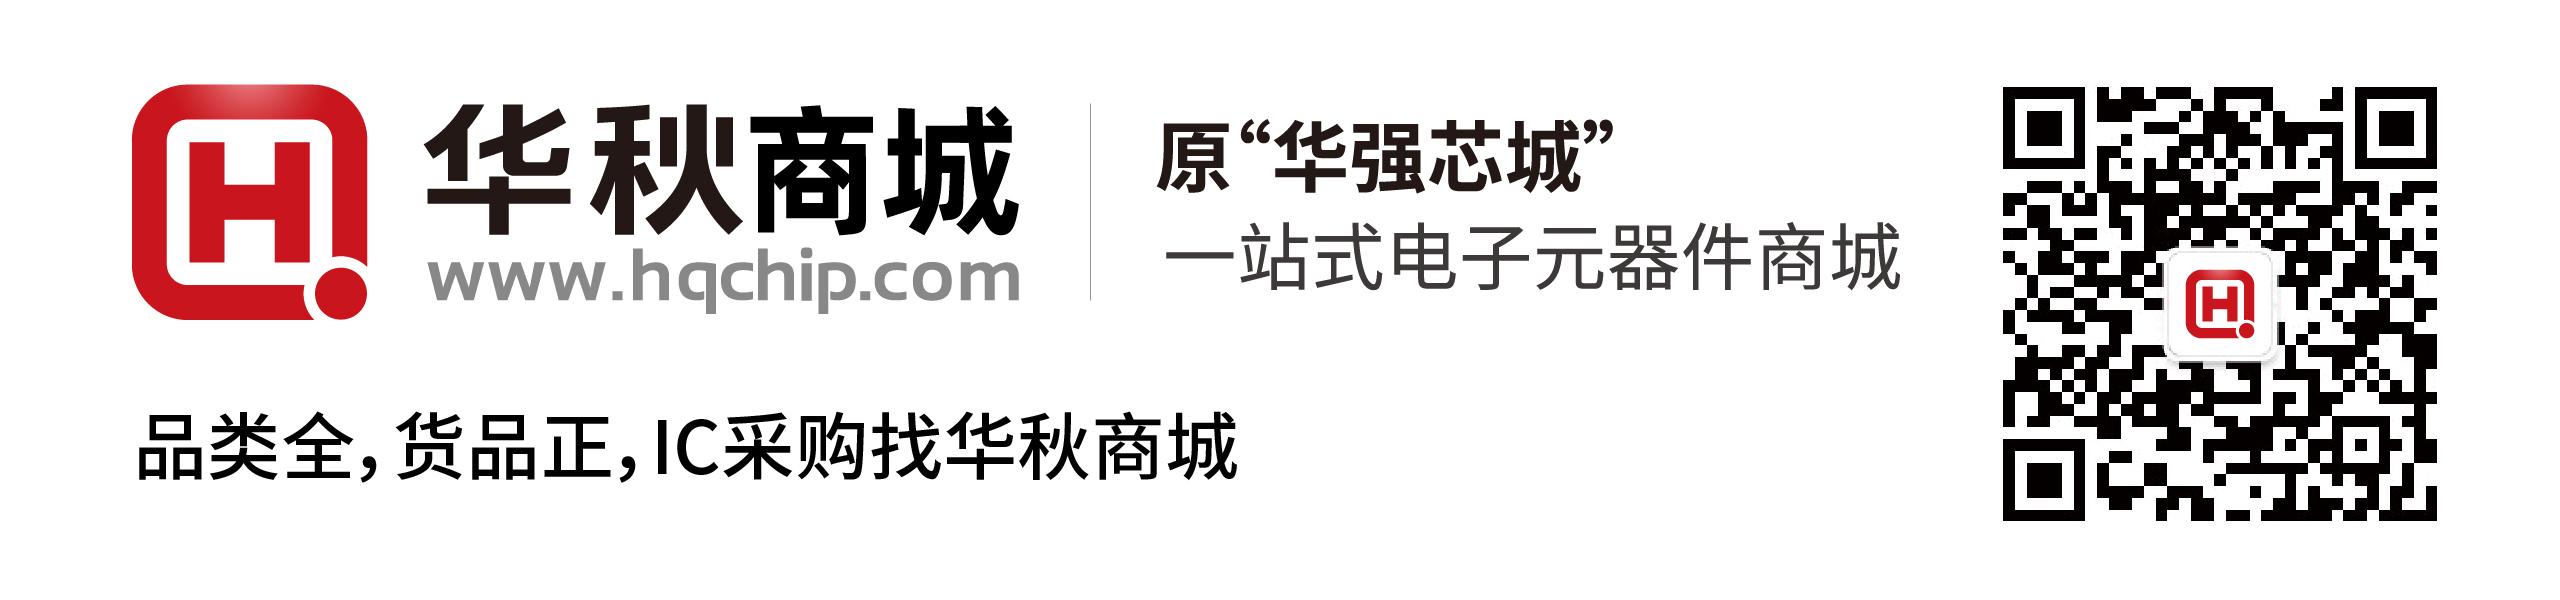 商城公眾號微信尾圖banner.png